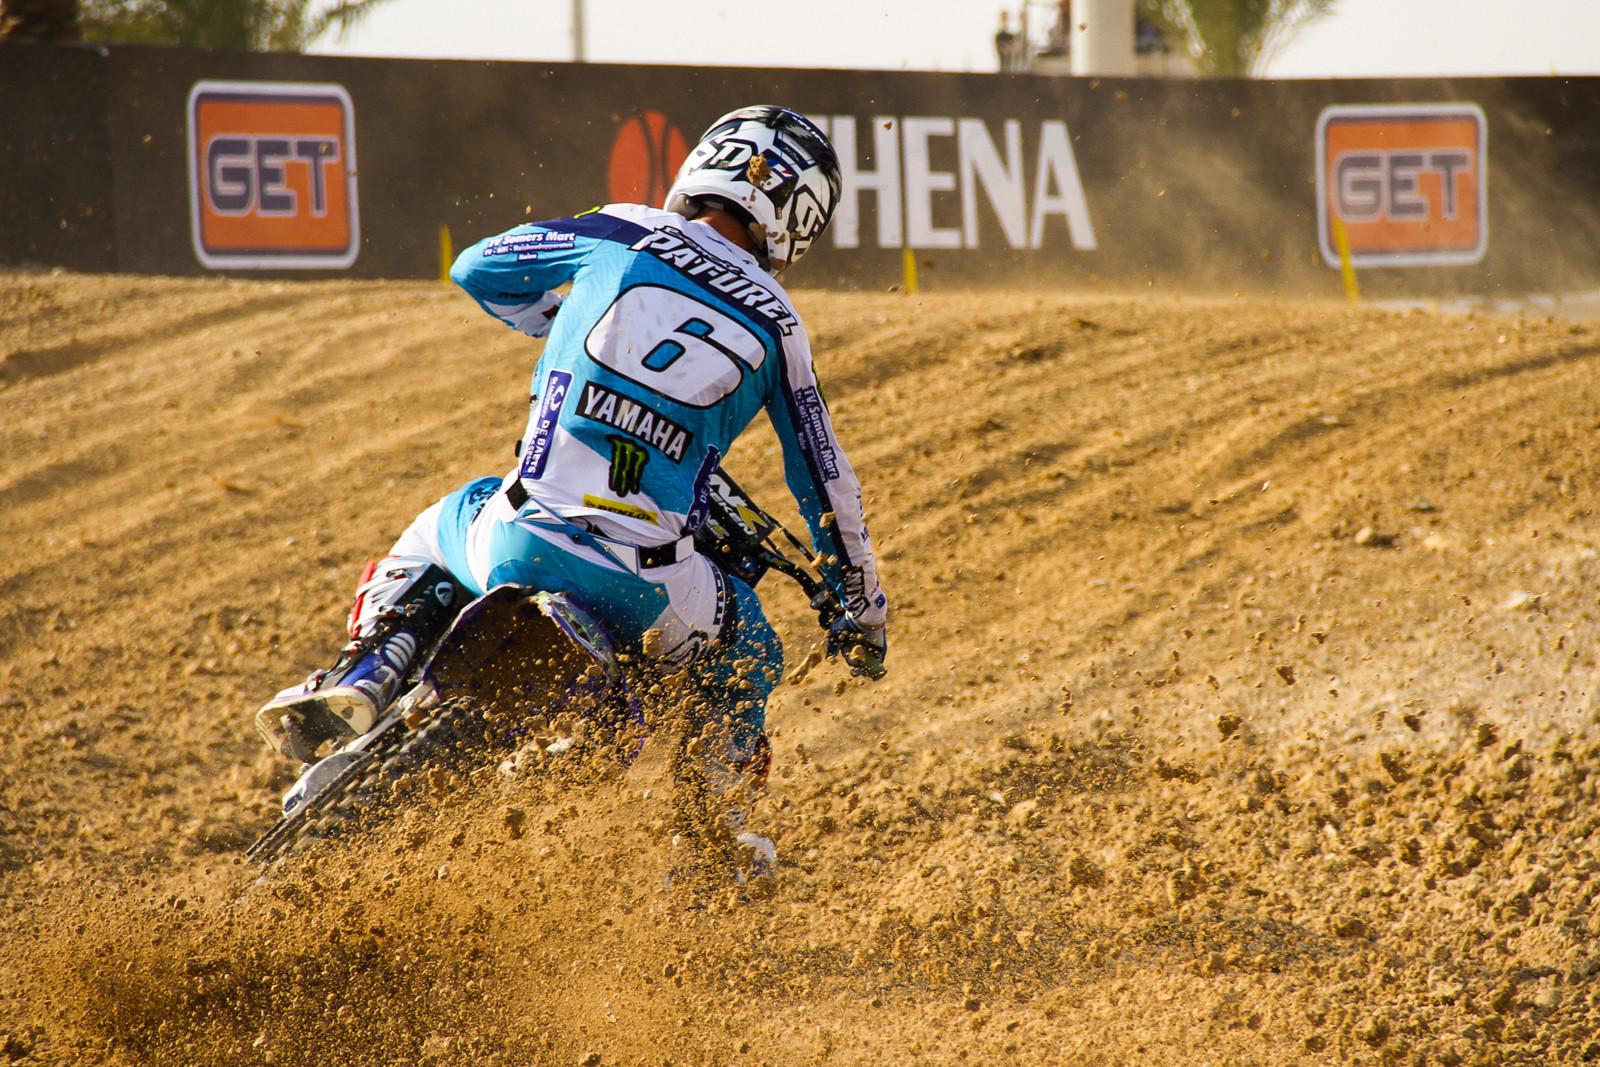 Benoit Paturel - Photo Blast: 2017 MXGP of Qatar - Motocross Pictures - Vital MX